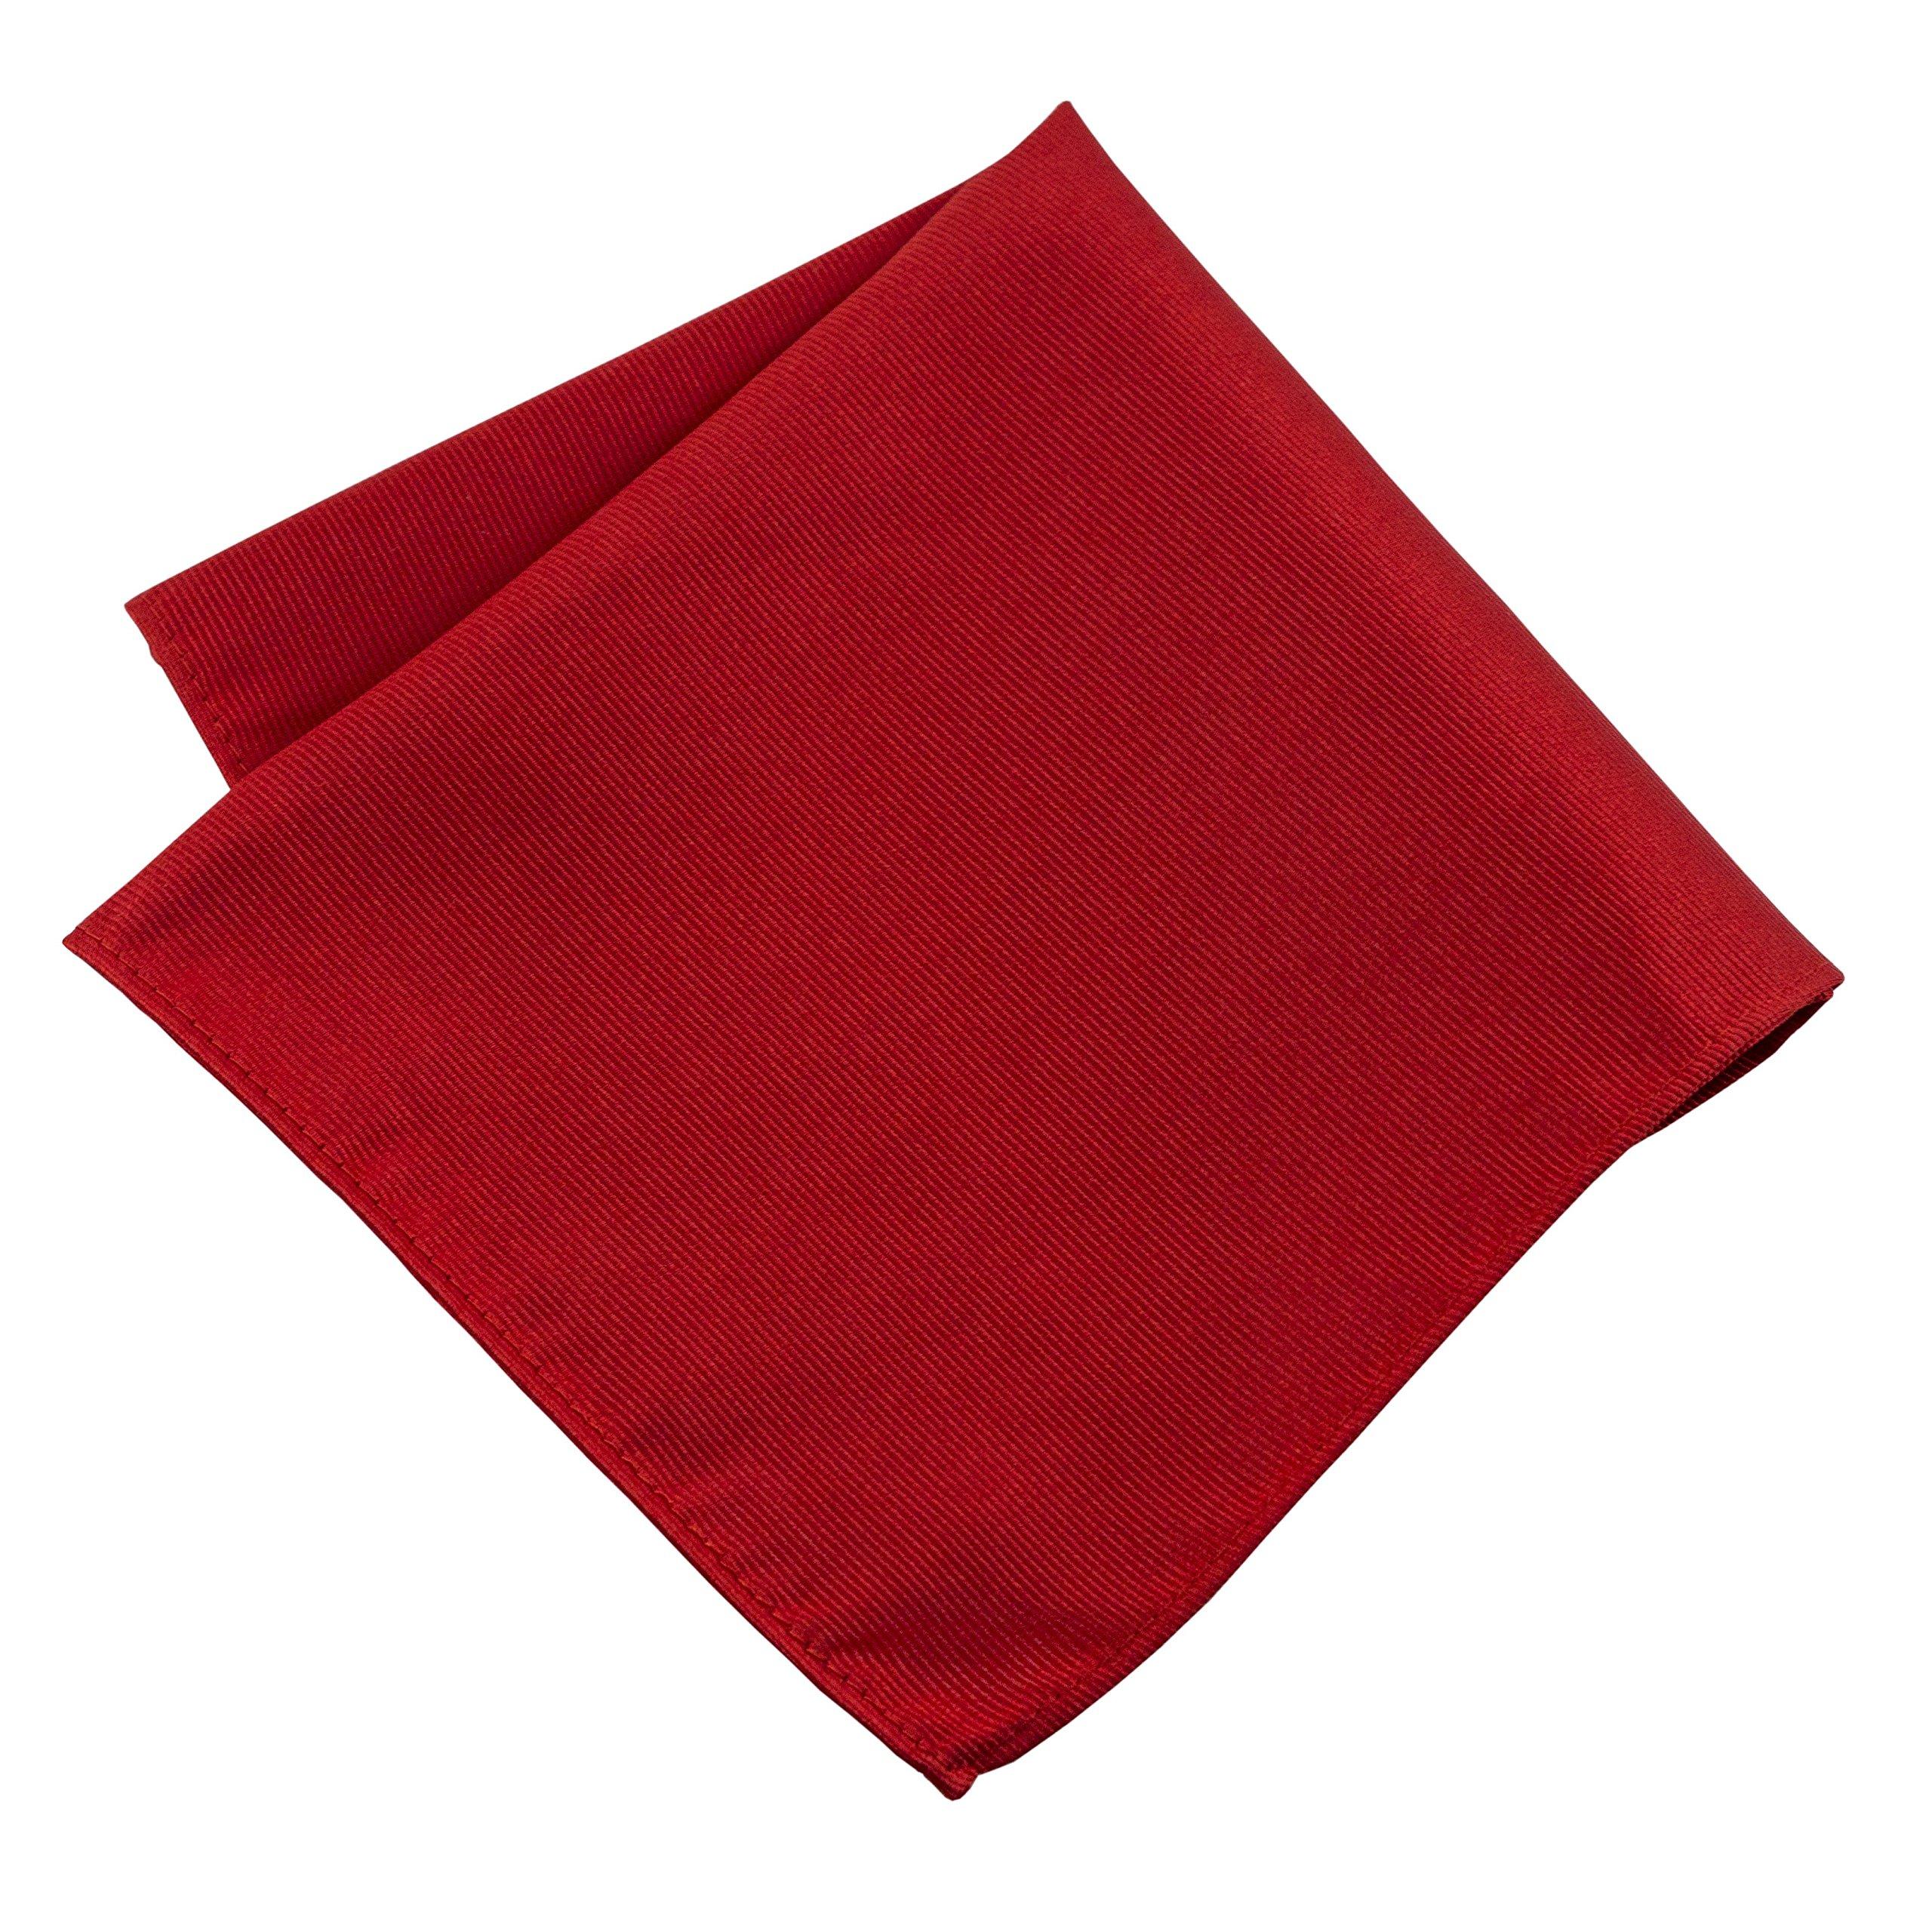 100% Silk Woven Red Pocket Square Handkerchief by John William